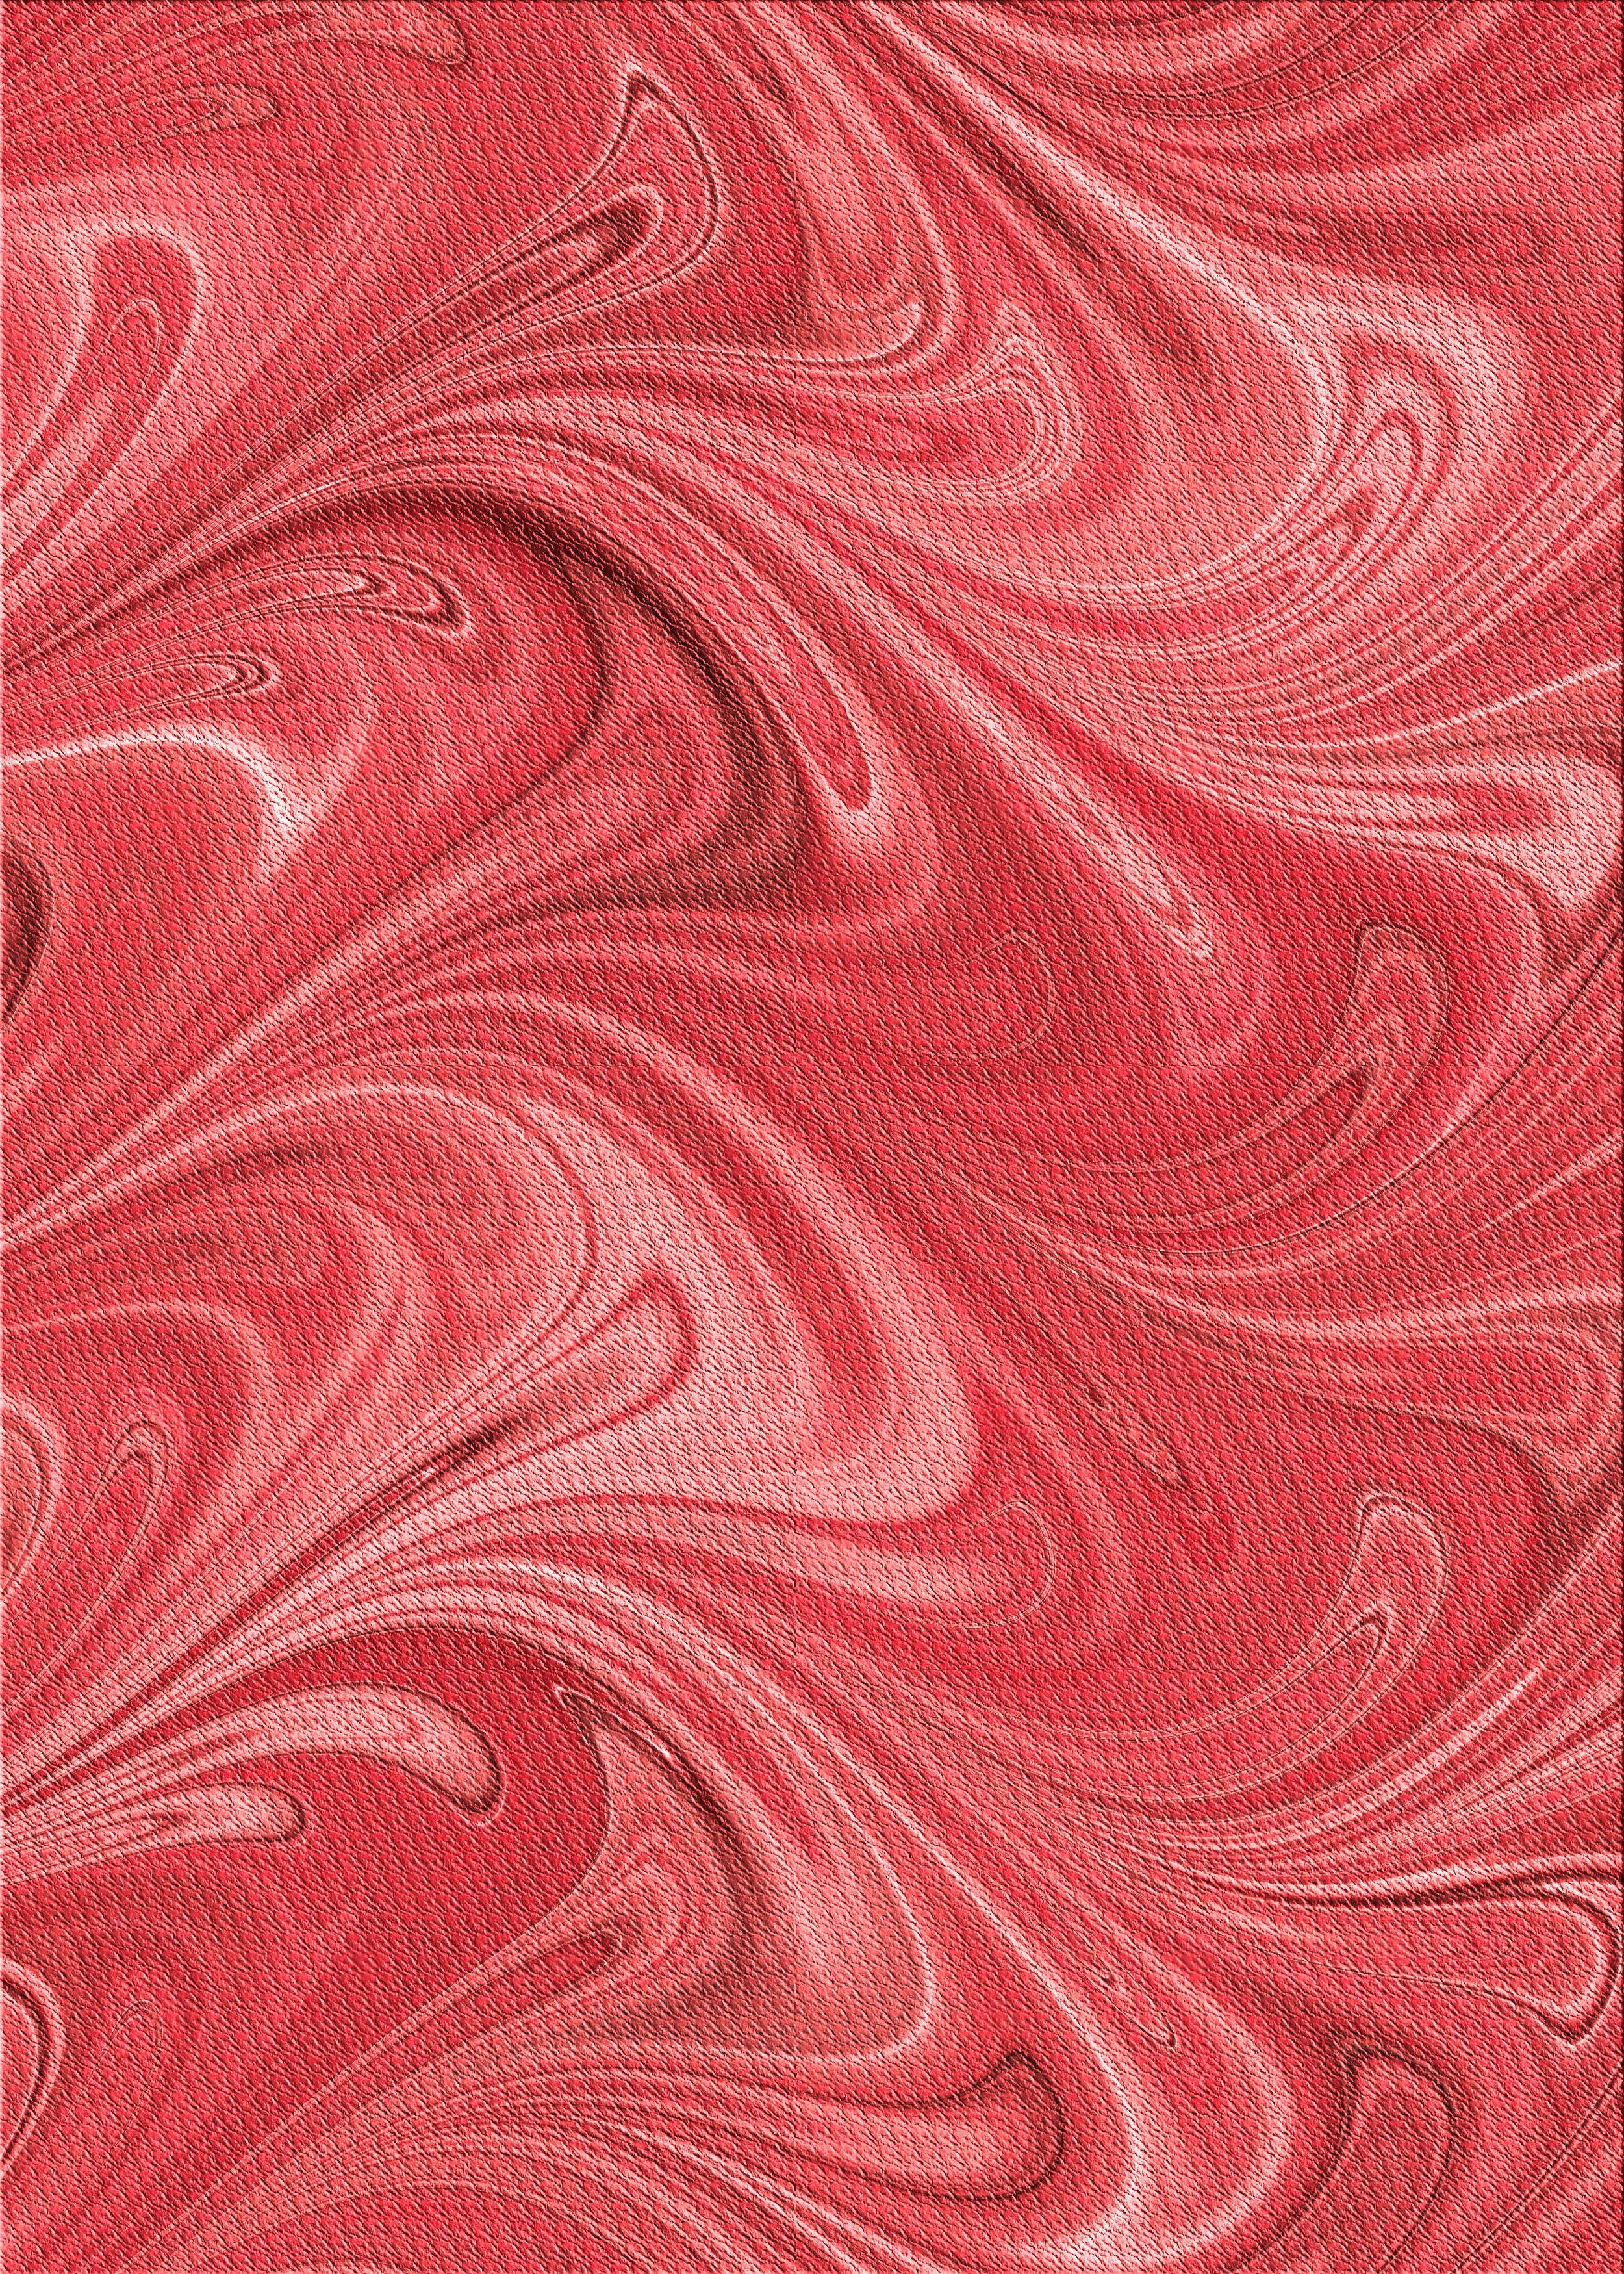 East Urban Home Fierro Abstract Wool Red Area Rug Wayfair